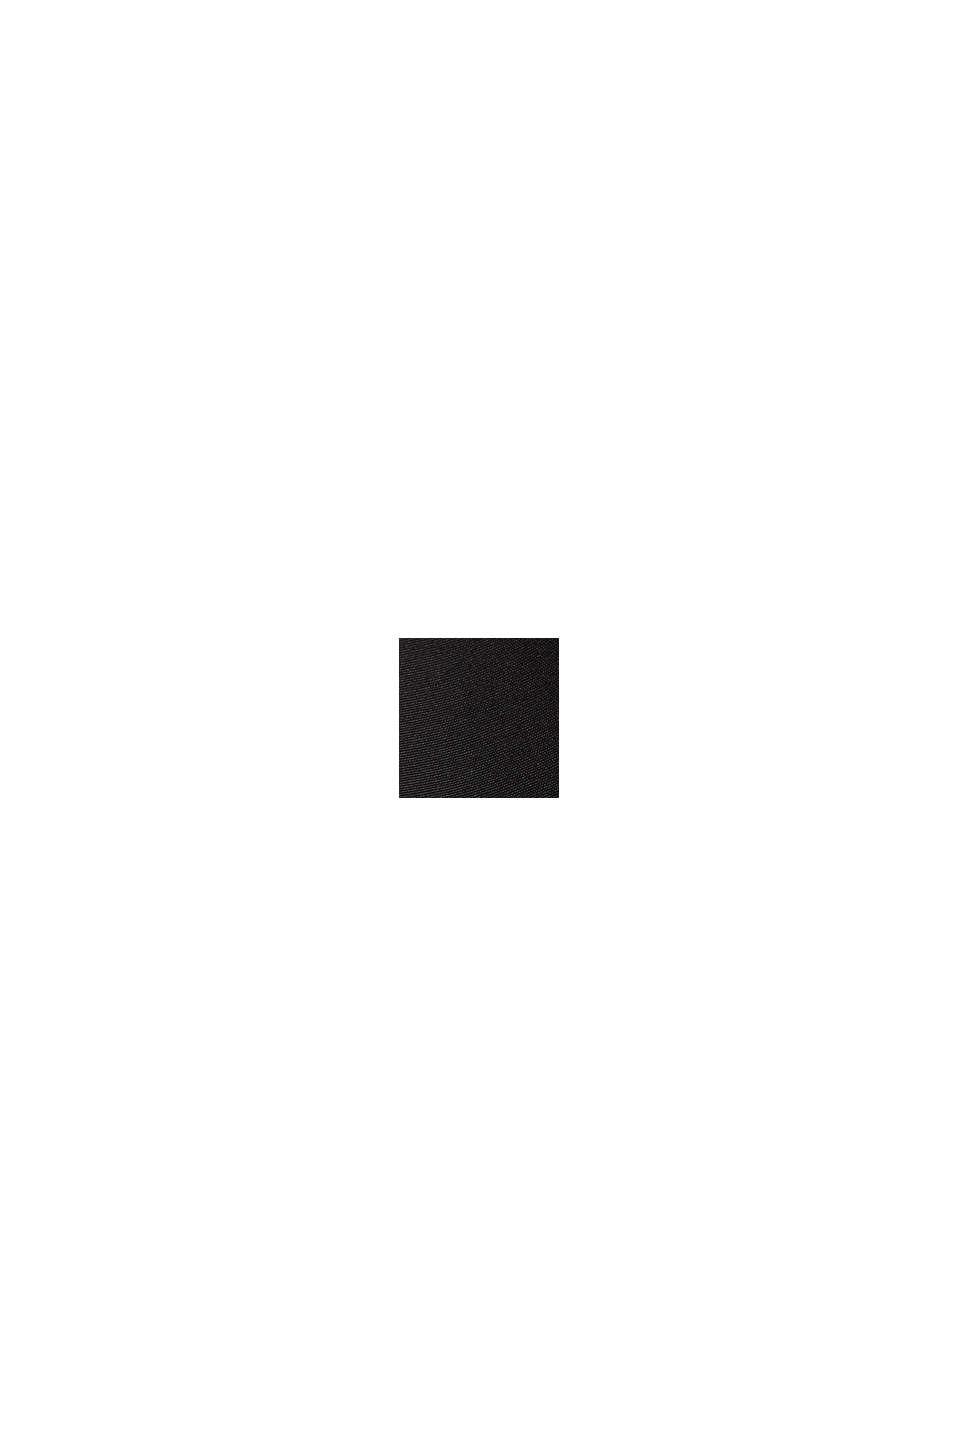 Gerecycled: jas in bomberstijl, BLACK, swatch